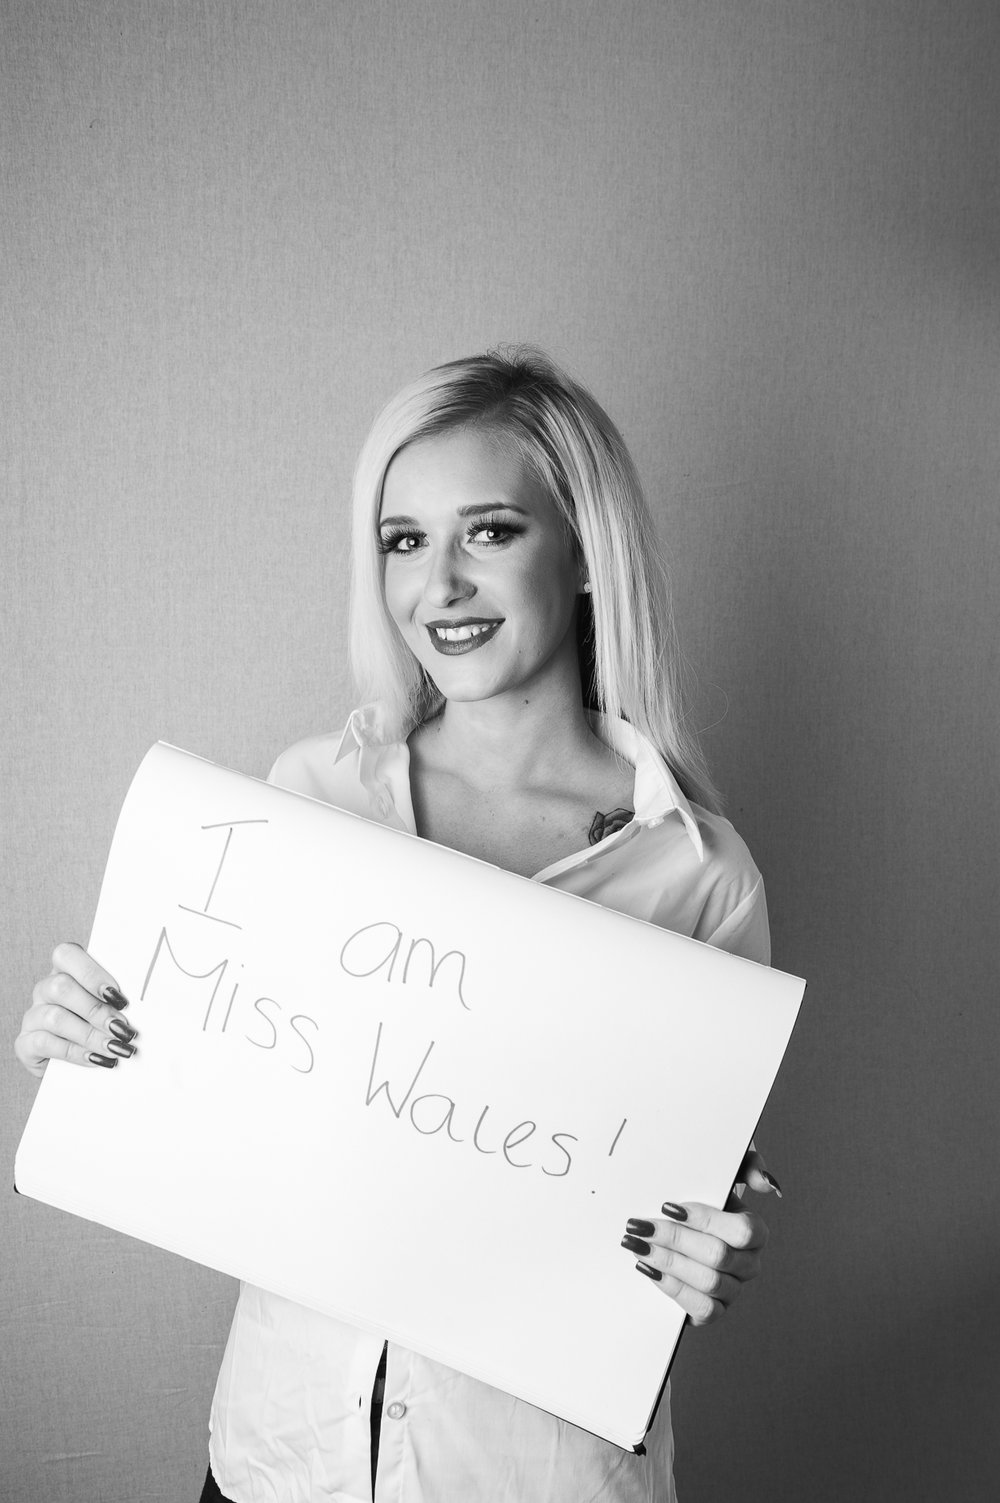 Carol Miss Wales 22.01.15-31.jpg